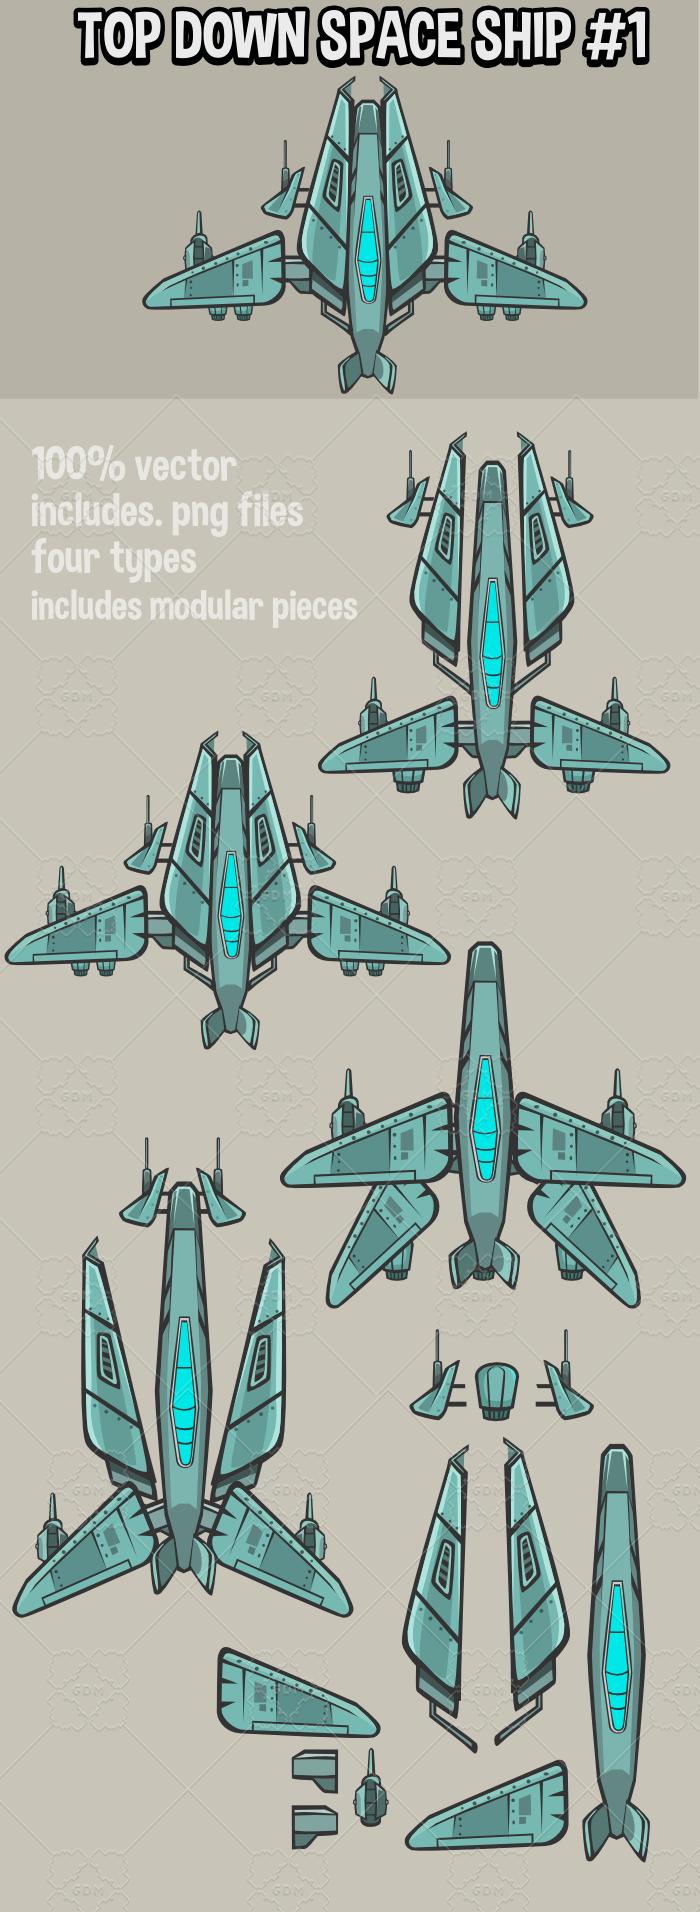 Top down spaceships 1